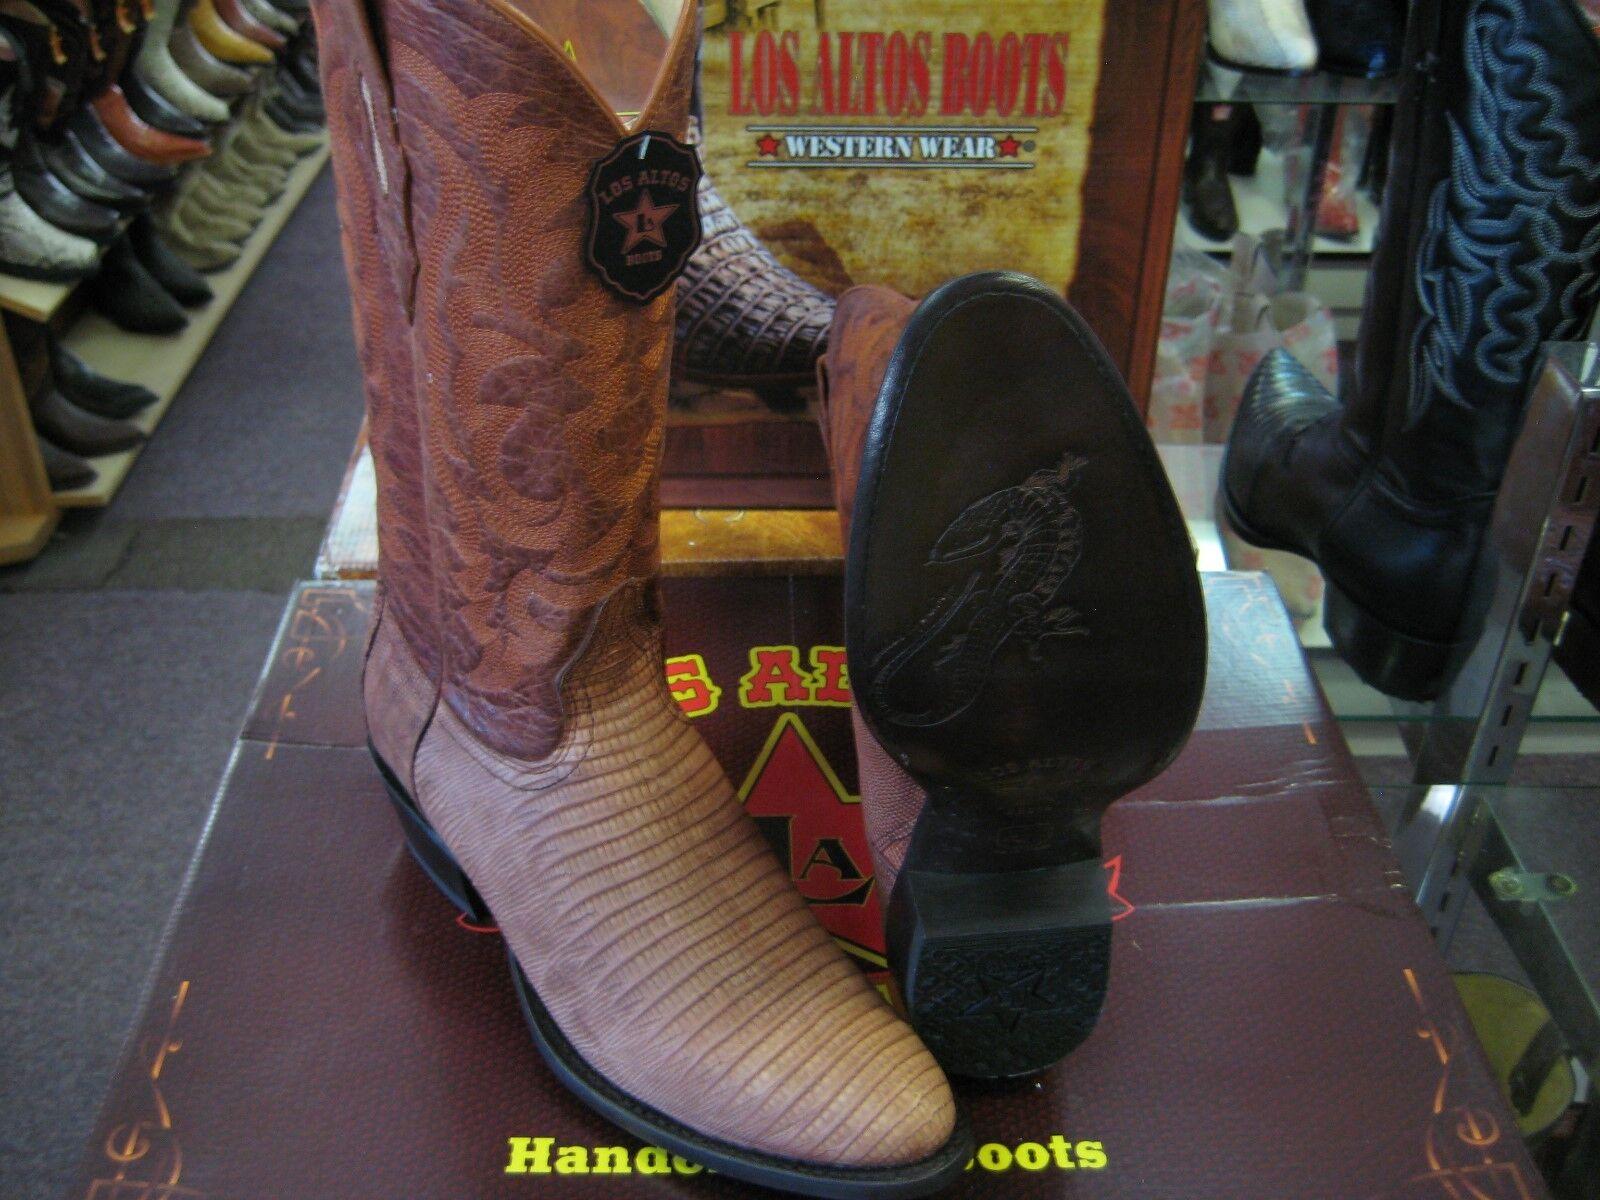 LOS ALTOS DULL COGNAC GENUINE TEJU LIZARD ROUND TOE WESTERN COWBOY BOOT 65G0703